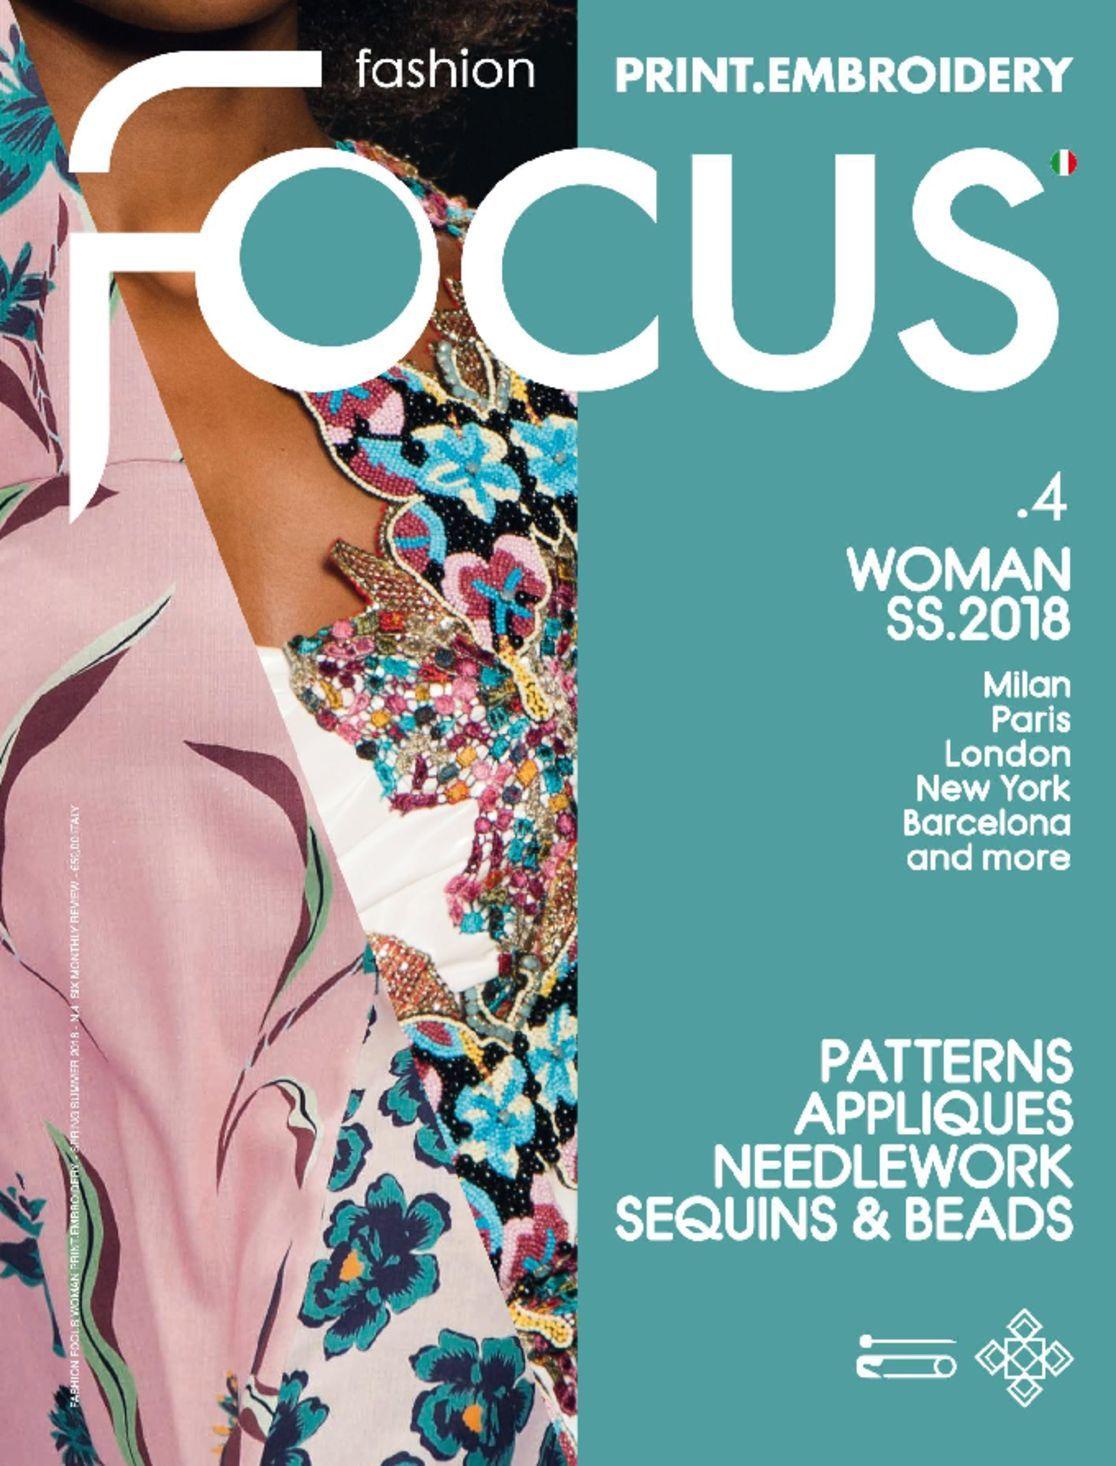 FASHION FOCUS WOMAN PRINTEMBROIDERY Digital